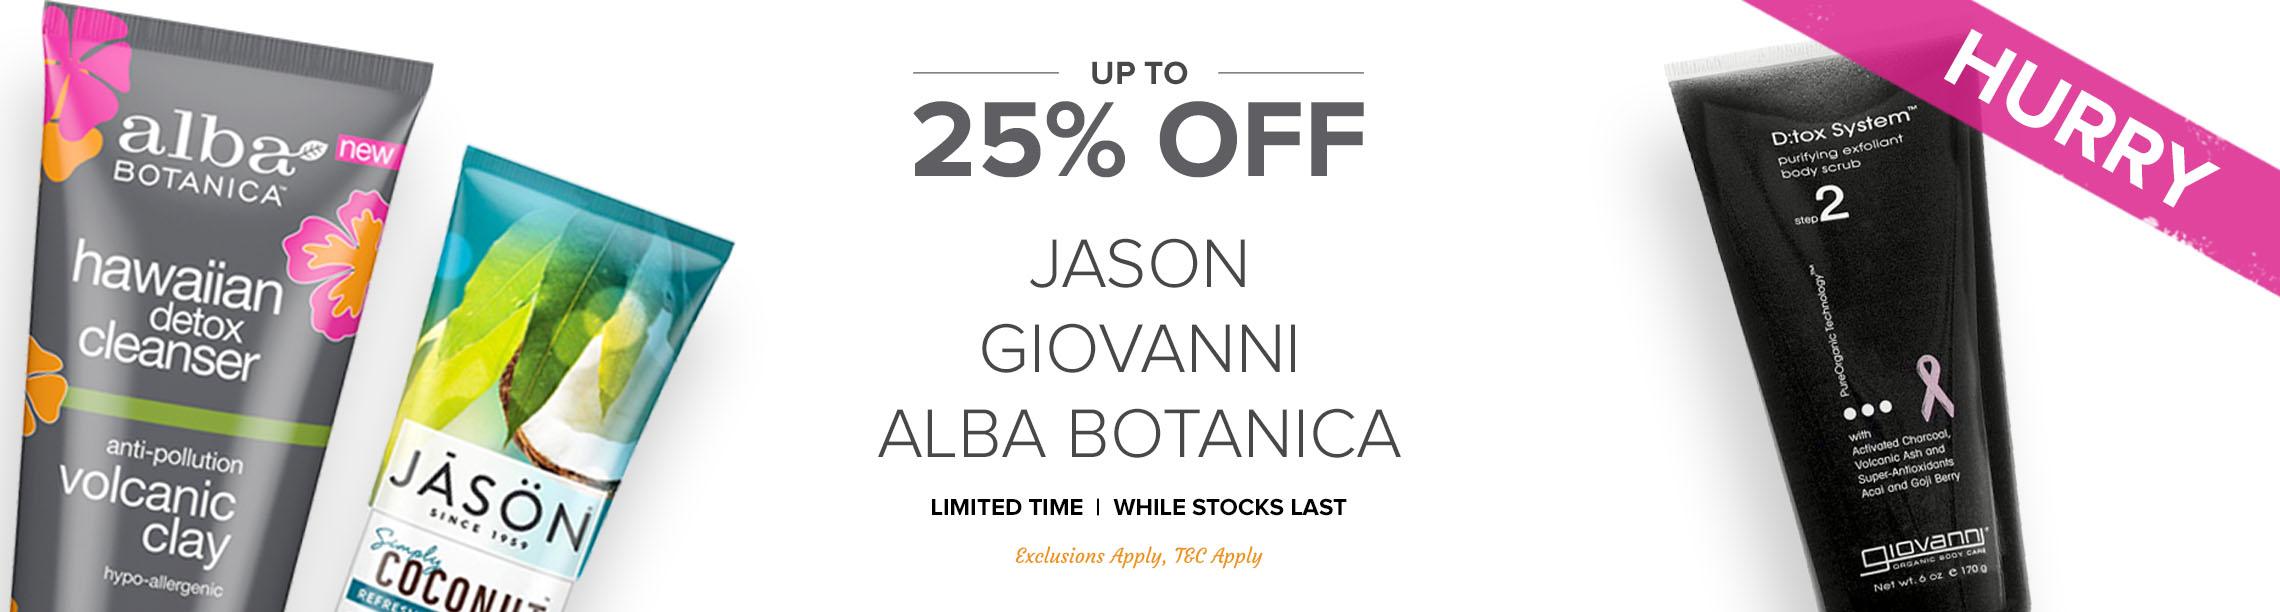 Up To 25% Off Jason, Giovanni and Alba Botanica